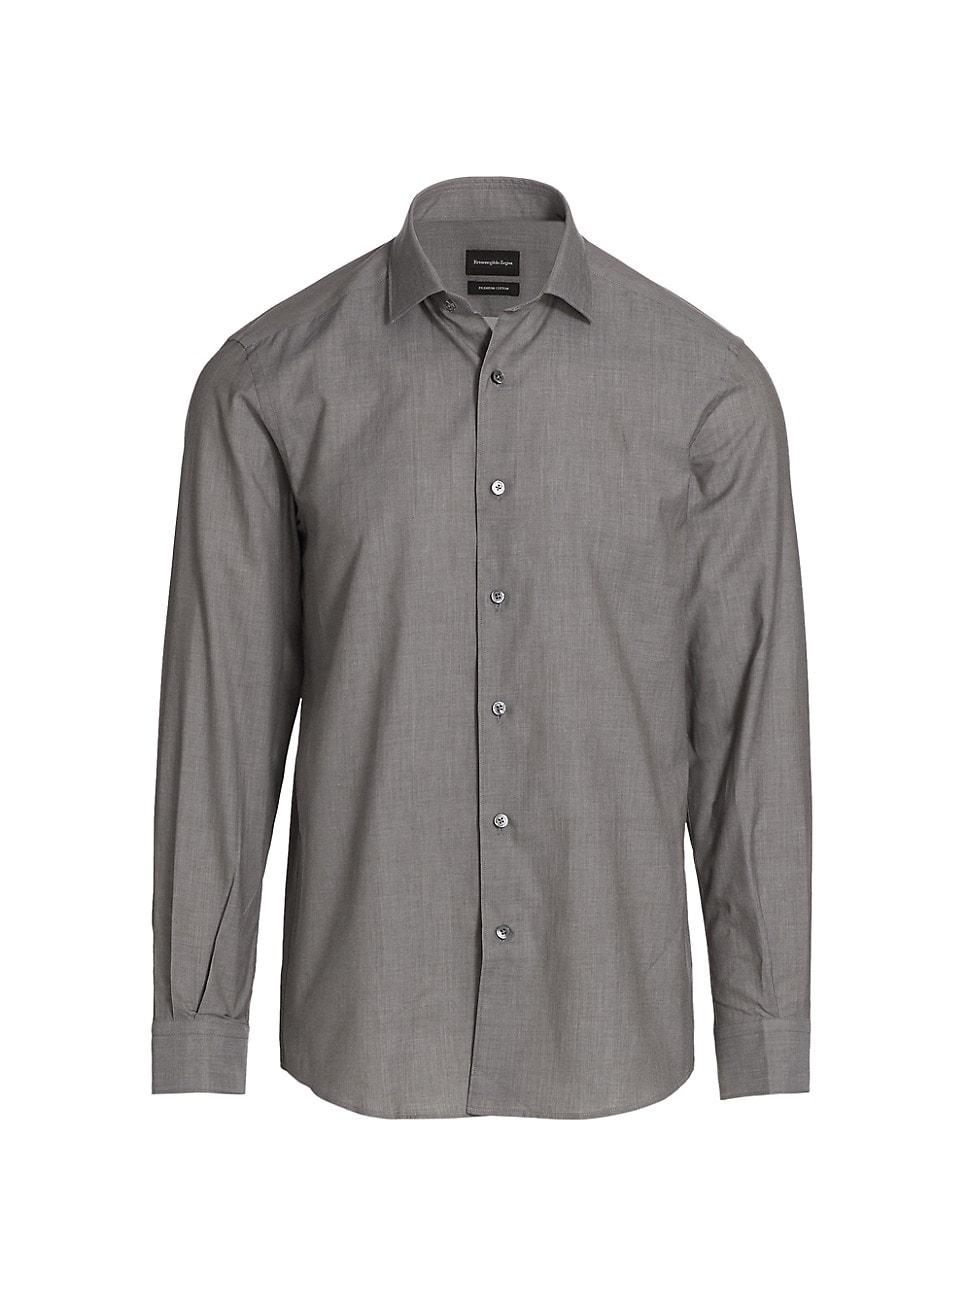 Ermenegildo Zegna Solid Sport Shirt In Dark Green Solid